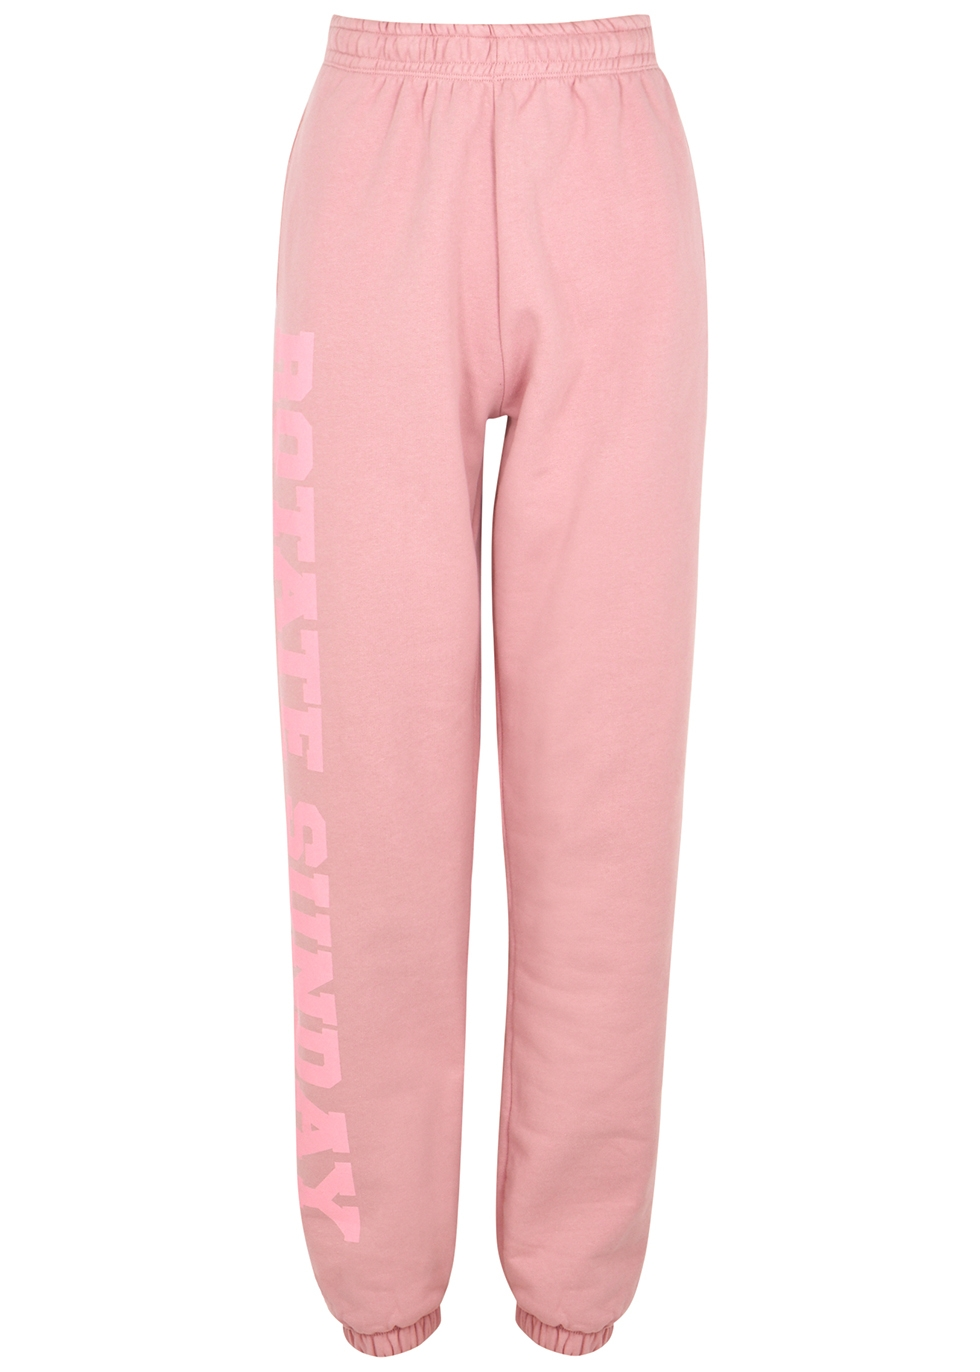 Mimi pink cotton sweatpants